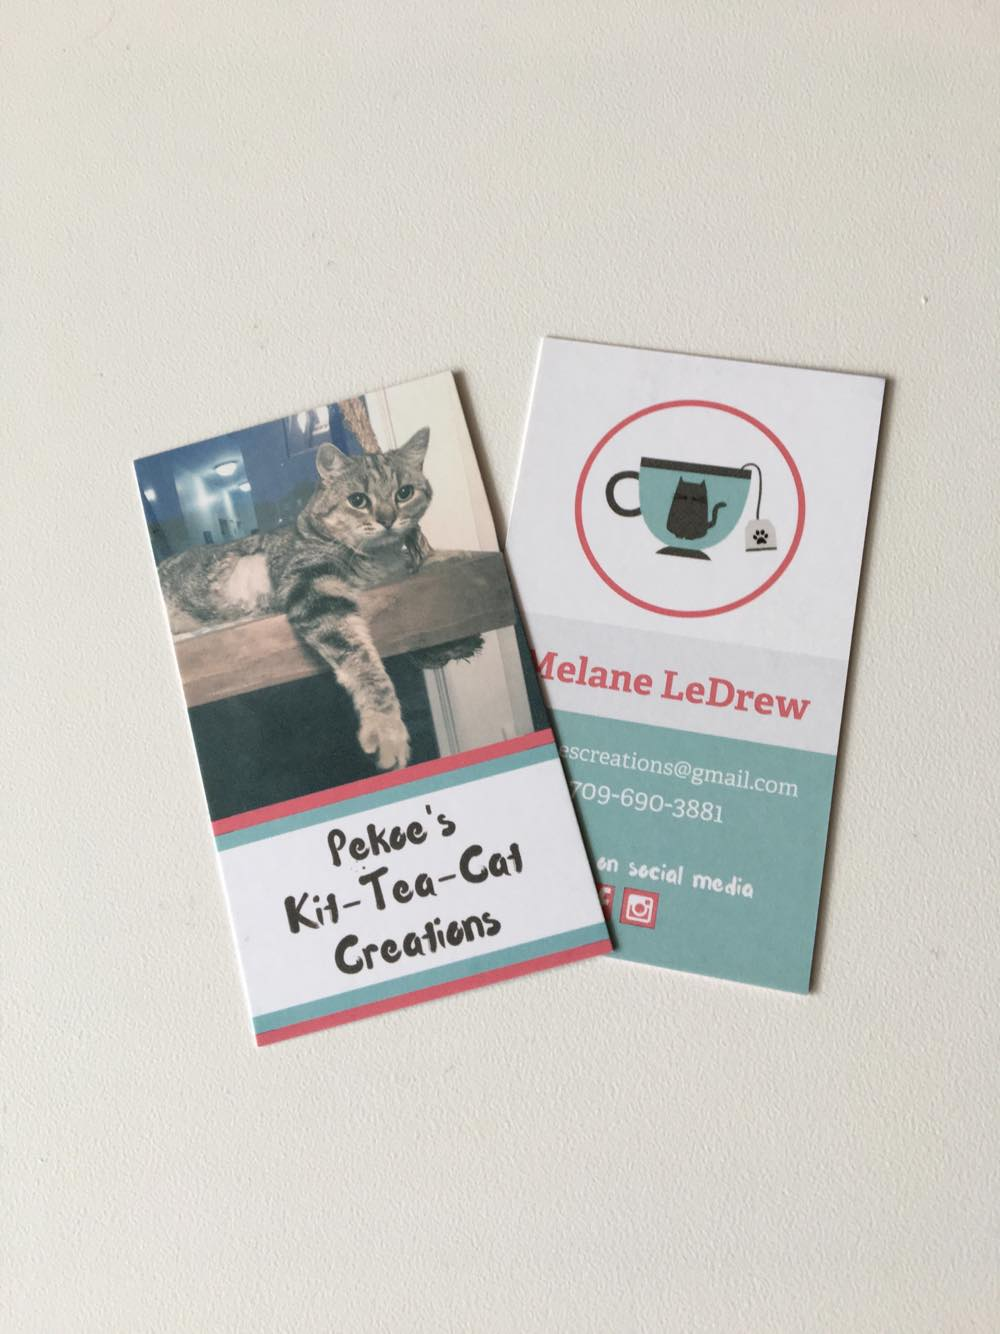 Pekoe's Kit-Tea-Cat Creations Business Card